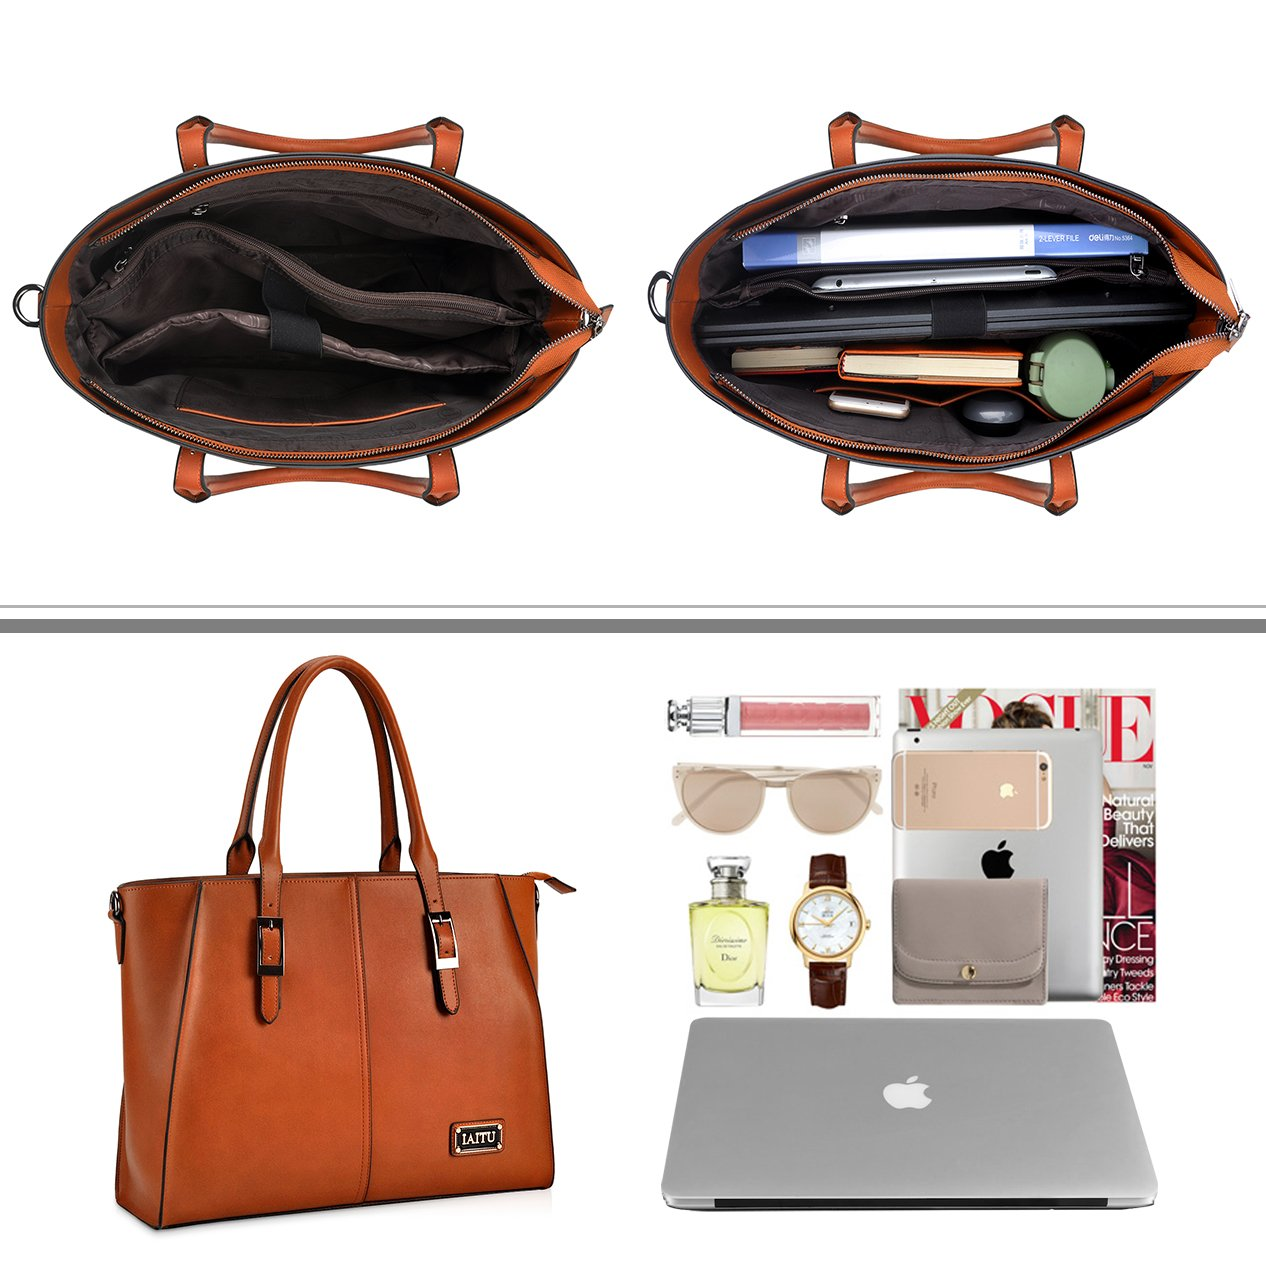 IAITU Laptop Tote Bag,15.6 Inch Crossbody Laptop Bag Casual Work Business Handbag with Smooth Zipper for Women(Brown) by IAITU (Image #3)